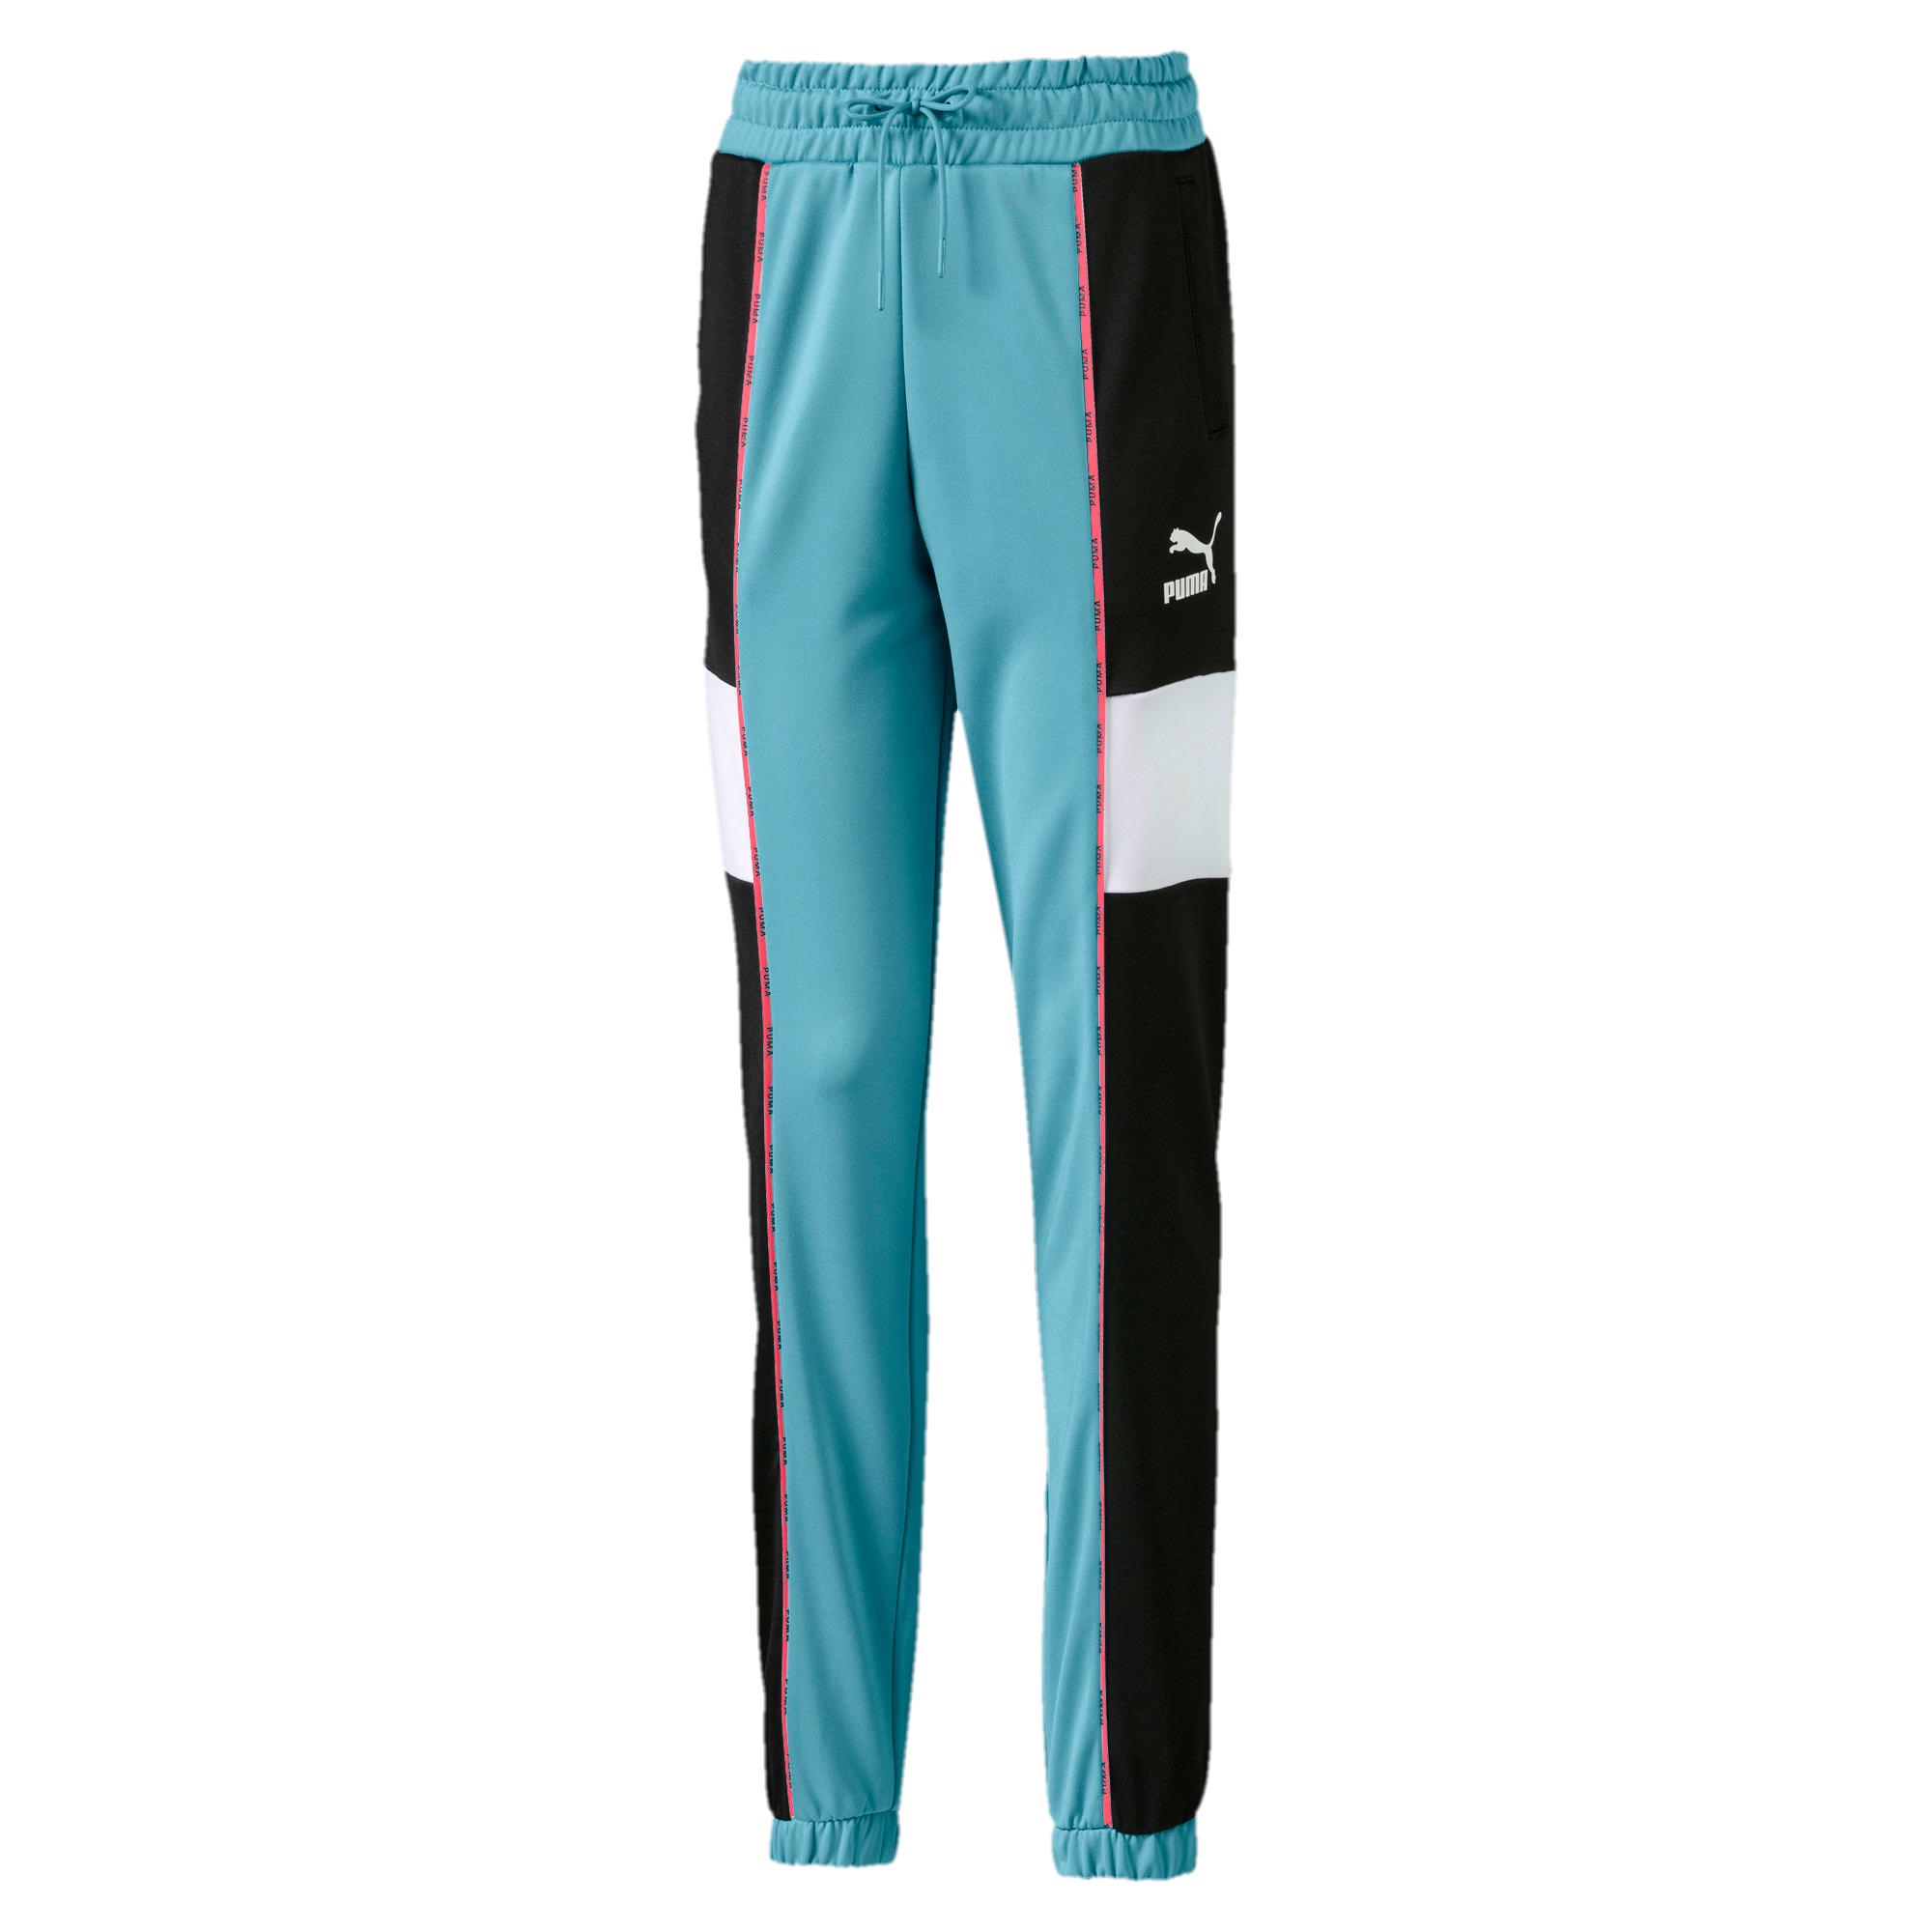 Miniatura 1 de Pantalones deportivos PUMA XTG para niña JR, Milky Blue, mediano